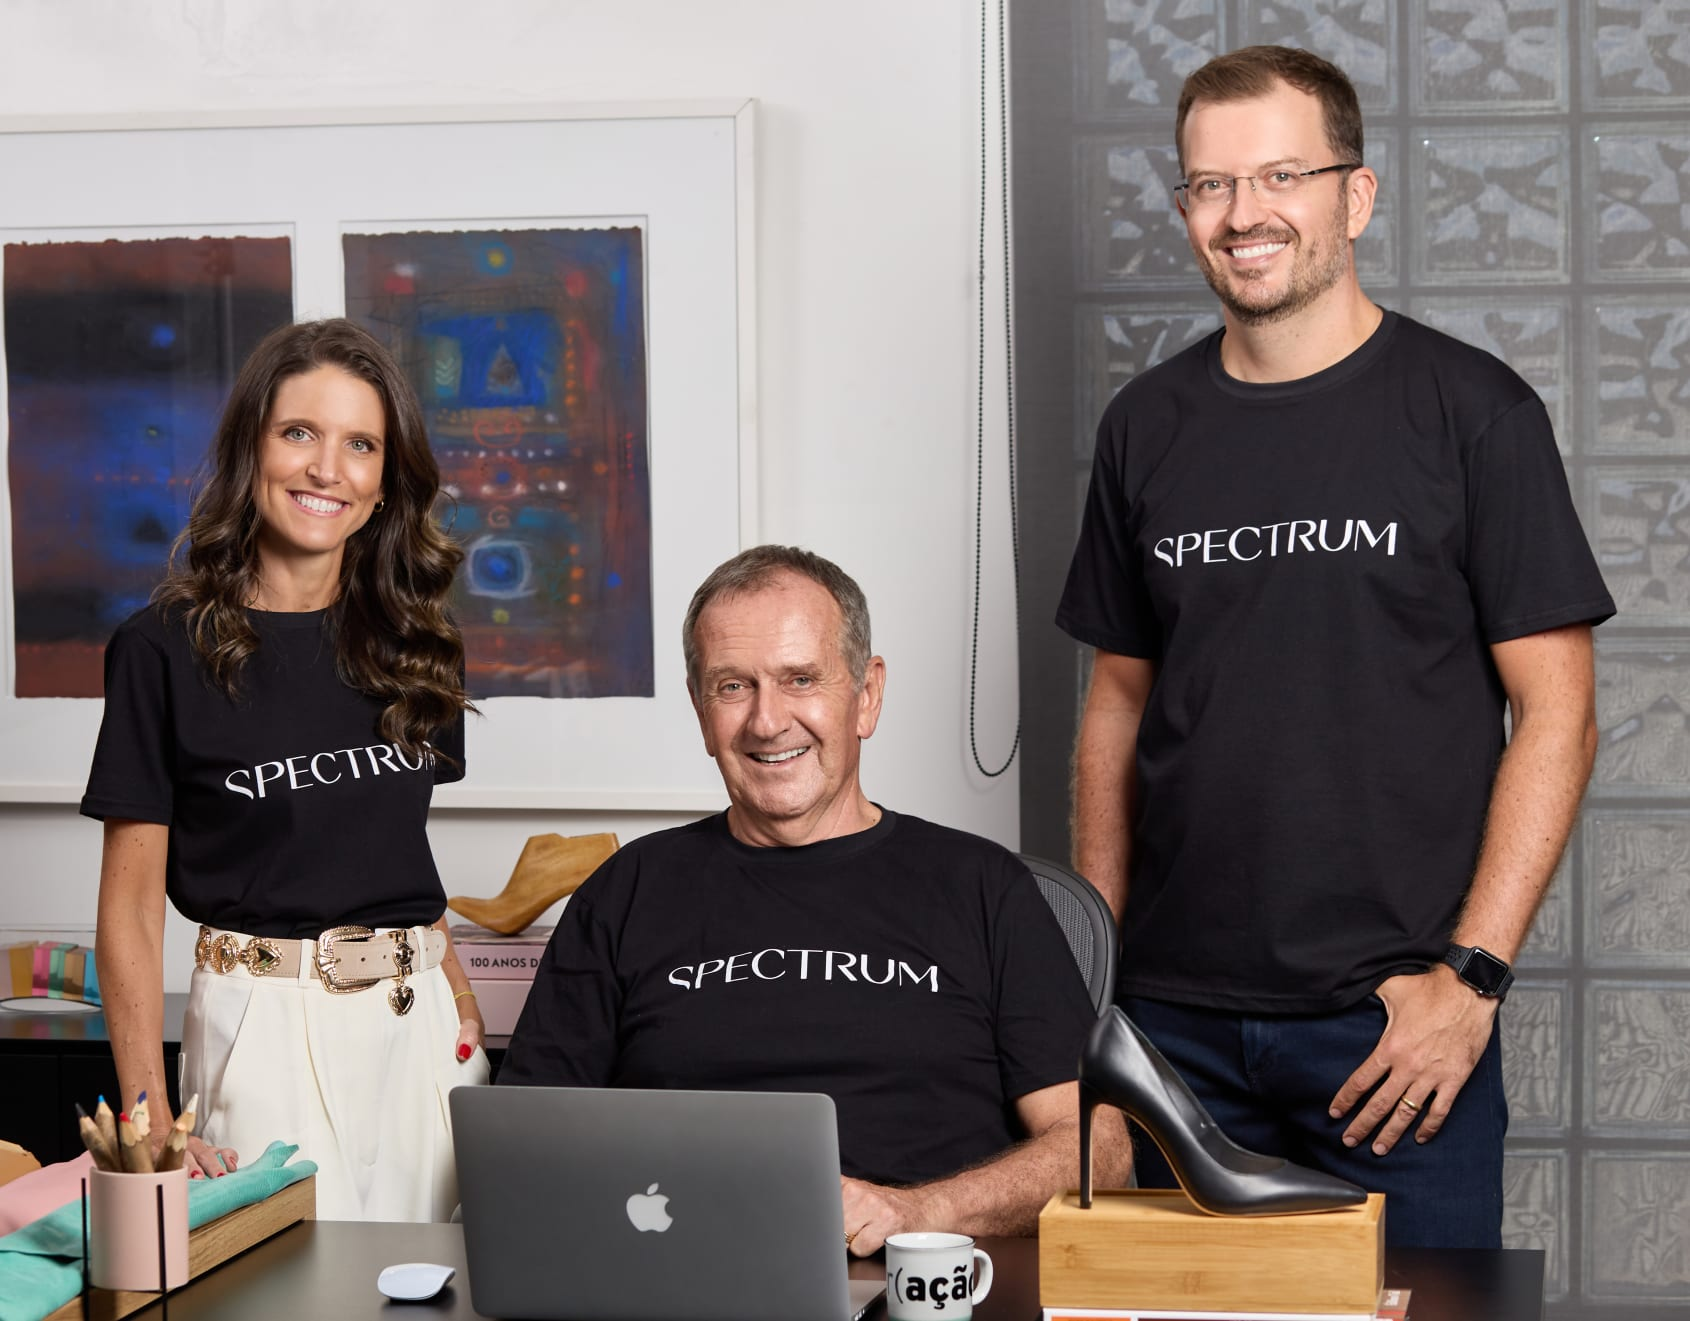 Foto da equipe Spectrum